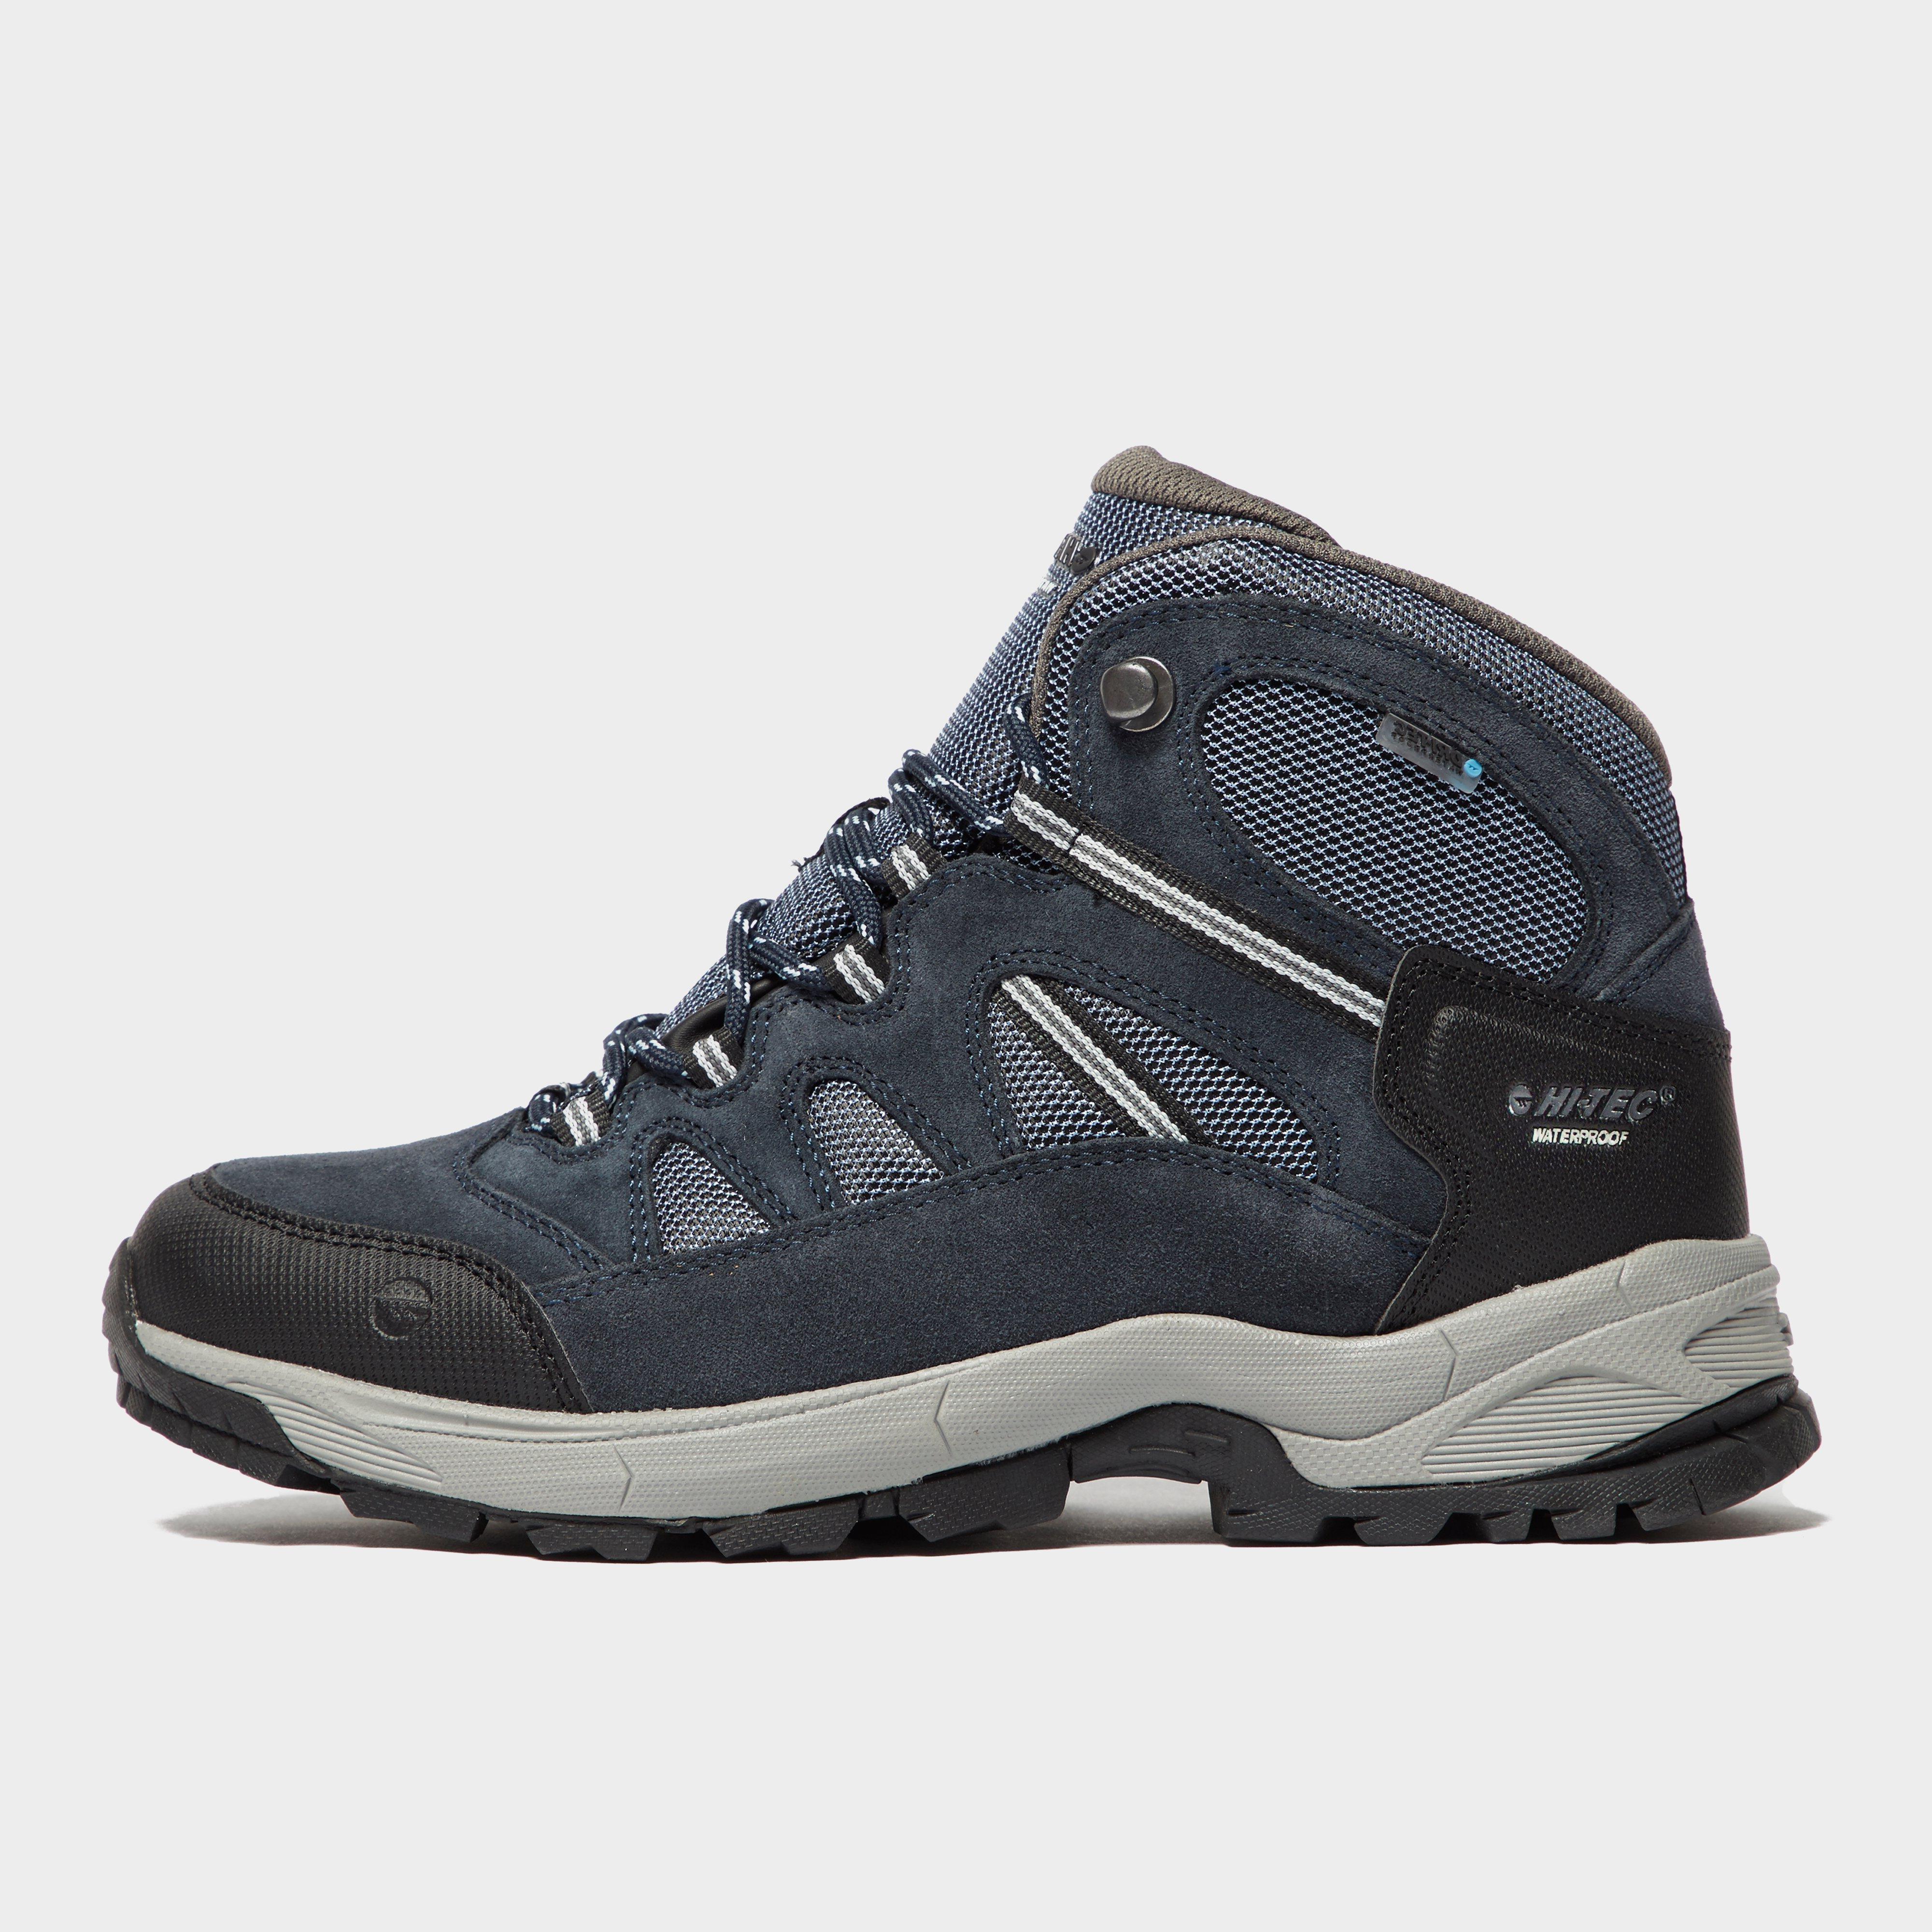 Hi Tec Hi Tec Womens Mount Lennox Waterproof Boot - Black, Black